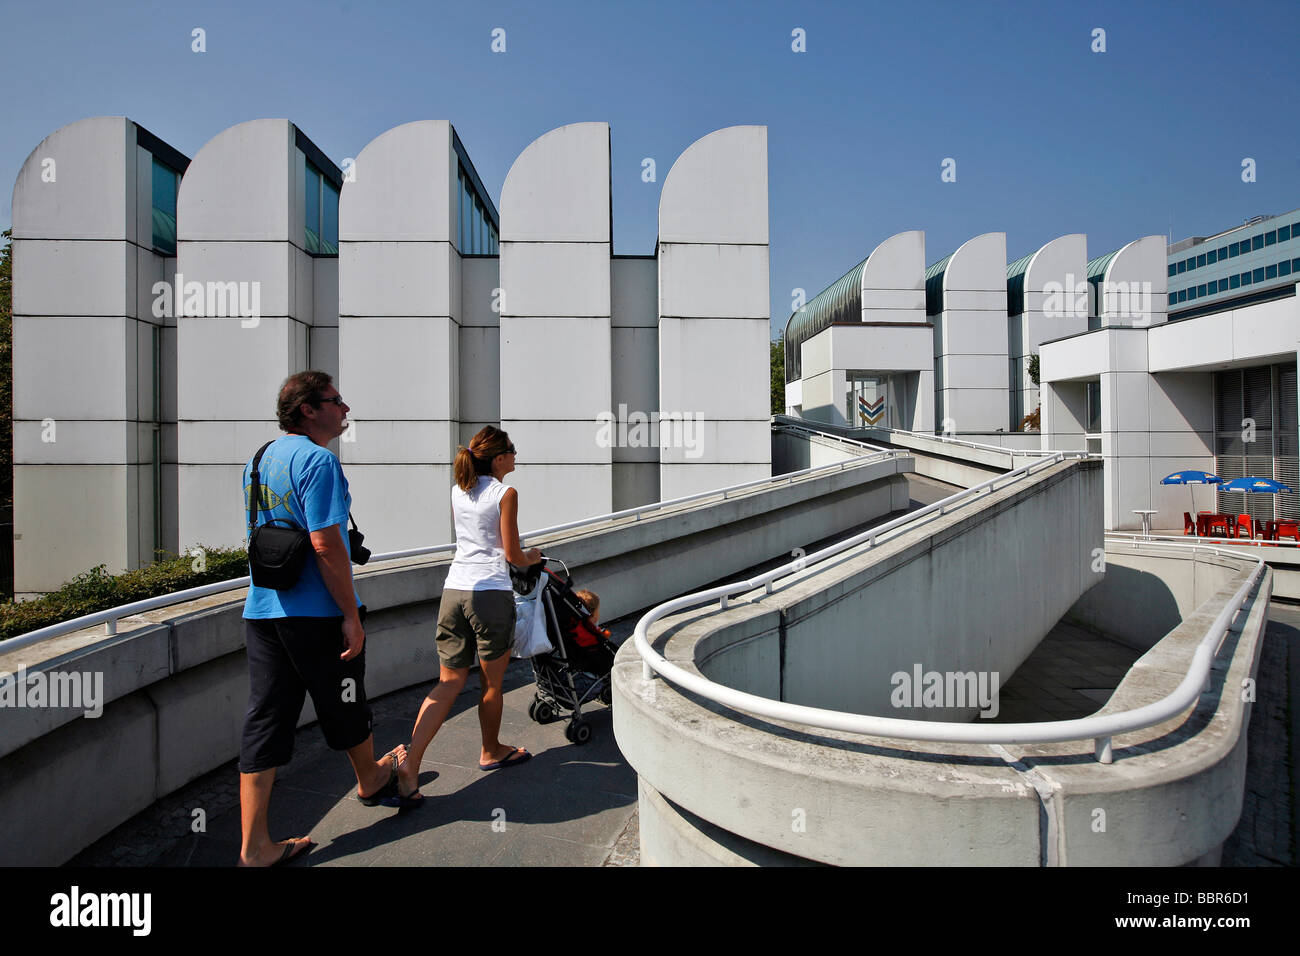 BAUHAUS ARCHIVES, BAUHAUS ARCHIV, MUSEUM FUR GESTALTUNG, BERLIN, GERMANY - Stock Image